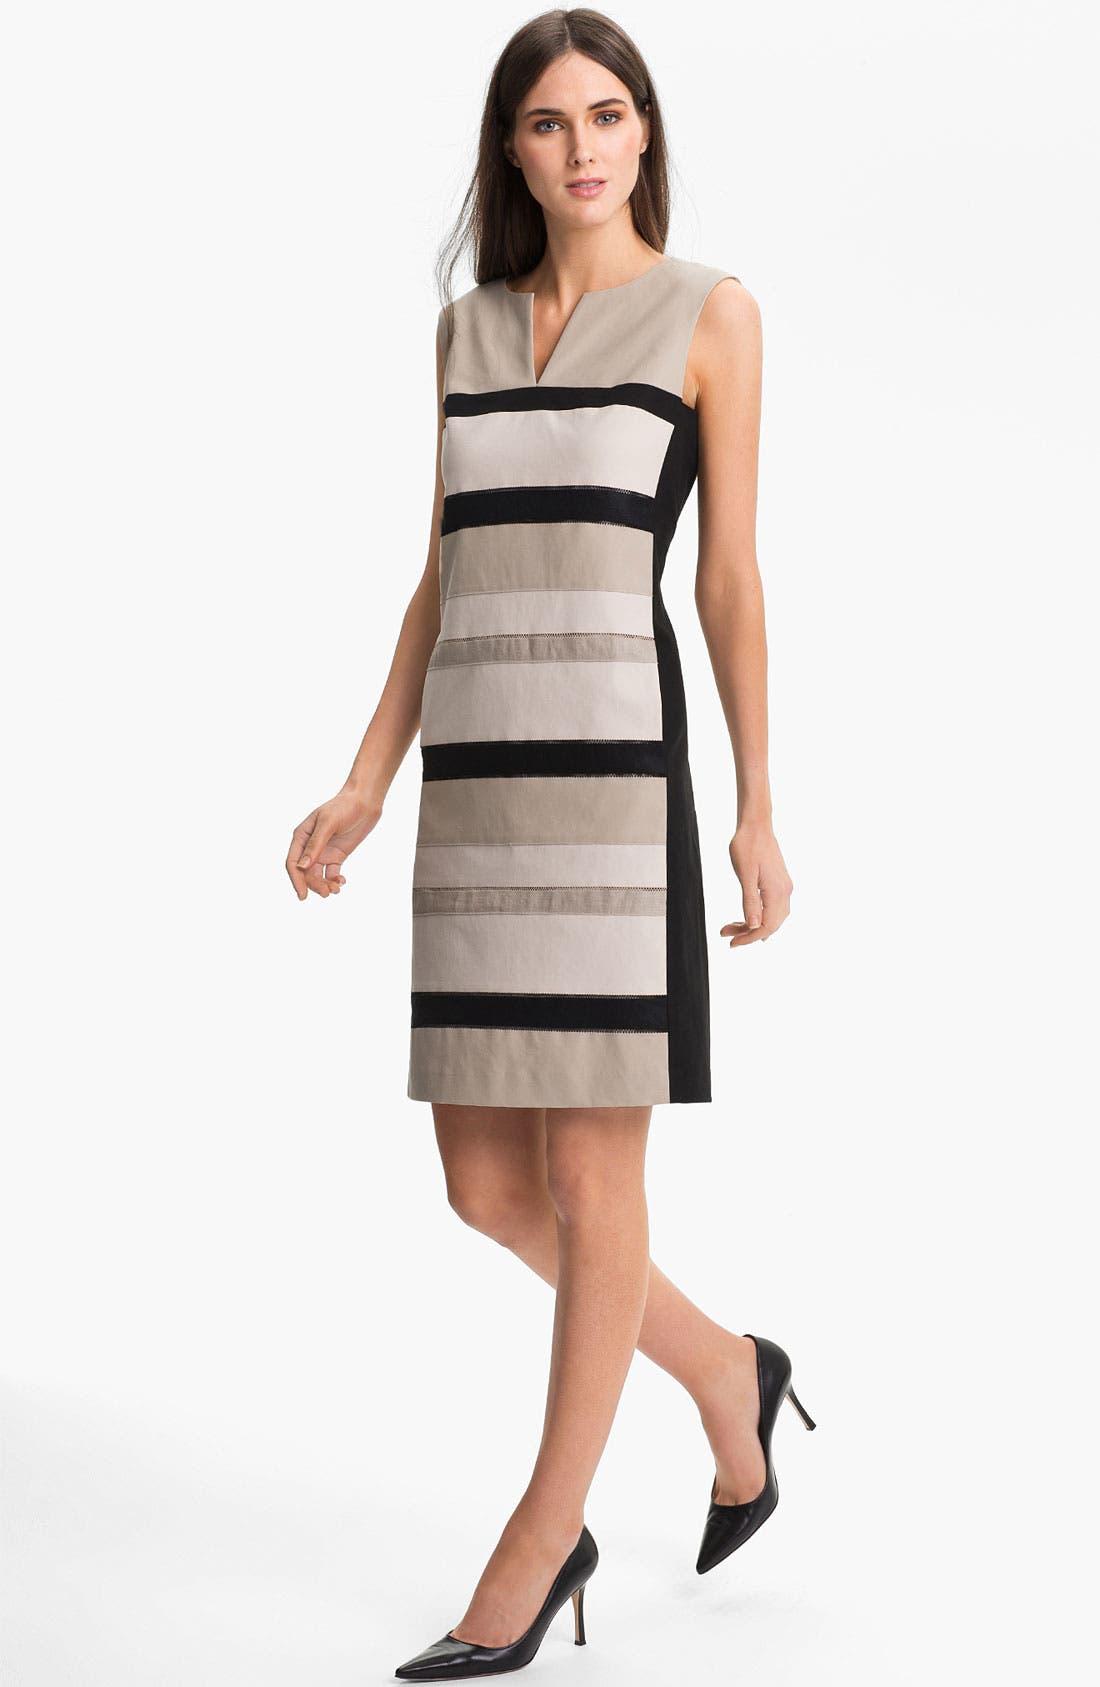 Alternate Image 1 Selected - Lafayette 148 New York 'Noel - Metropolitan Stretch' Dress (Online Only)